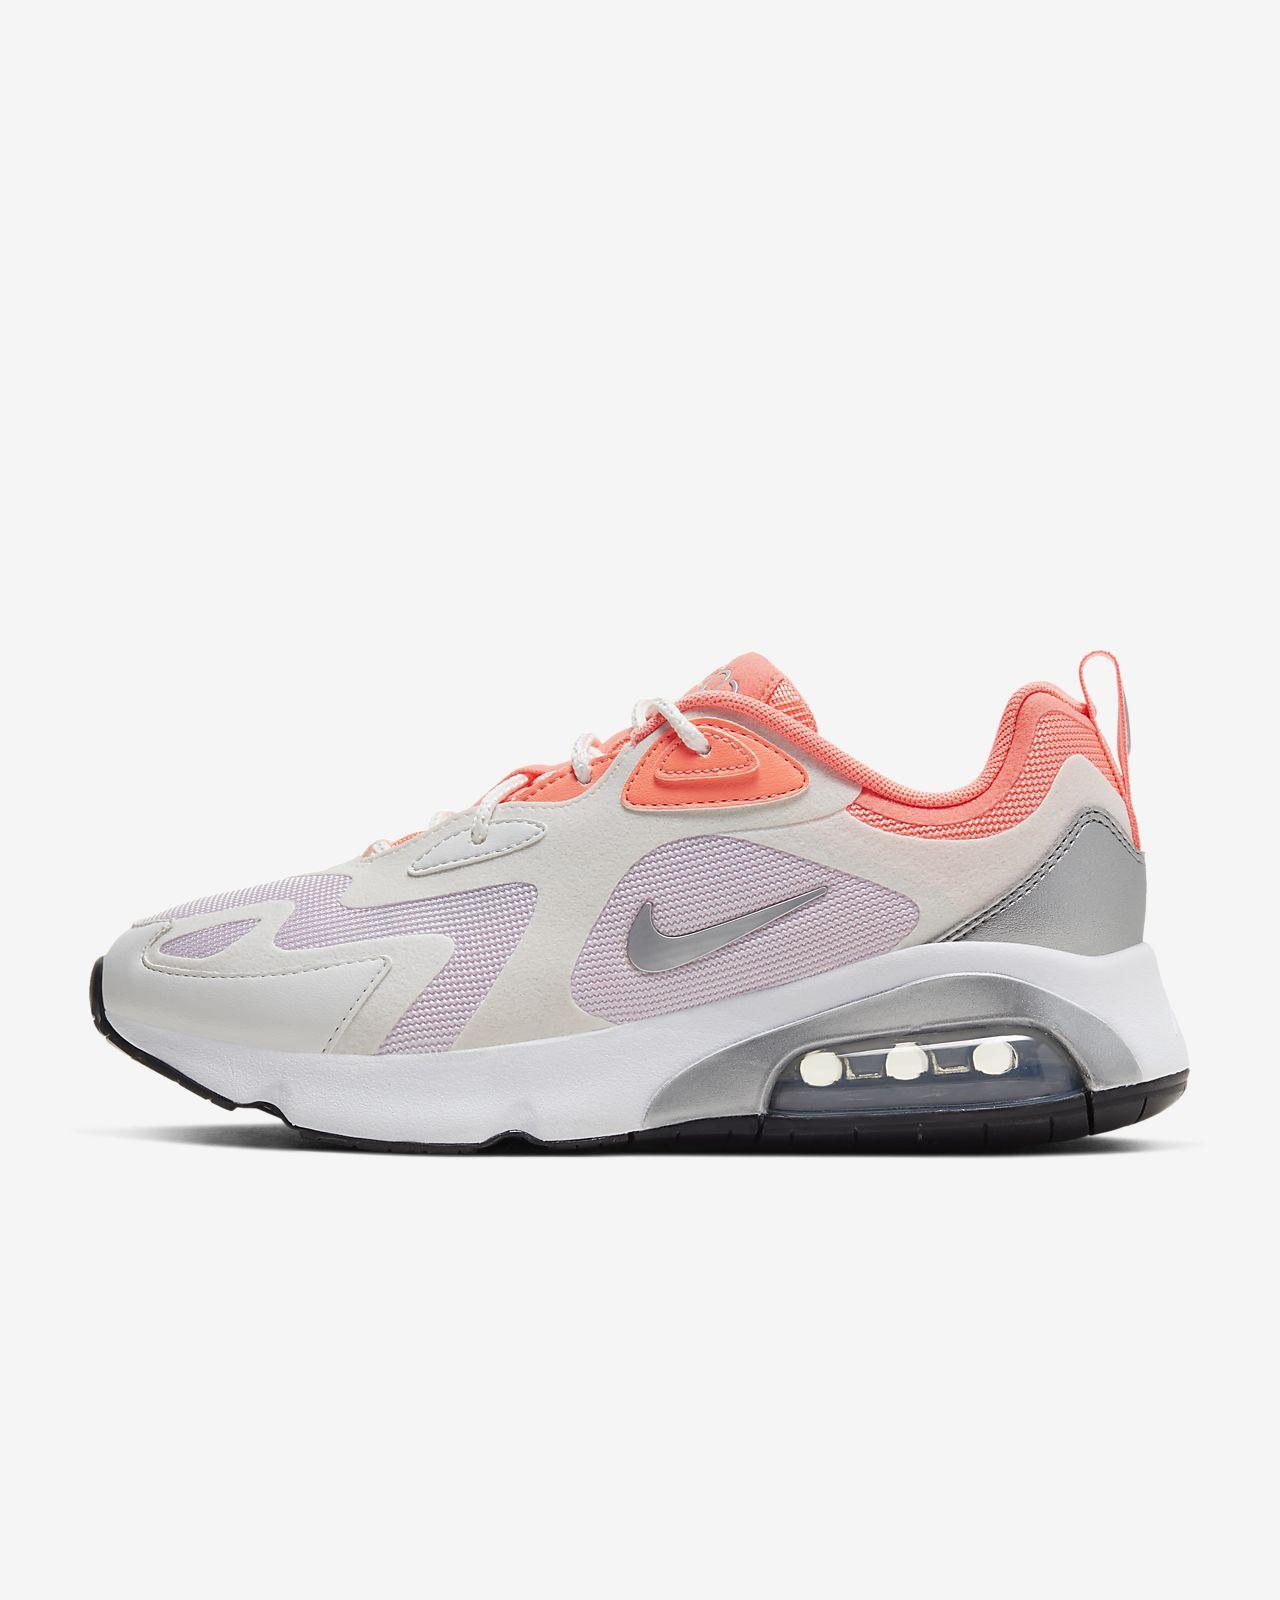 Nike Air Max 200 sko til kvinder